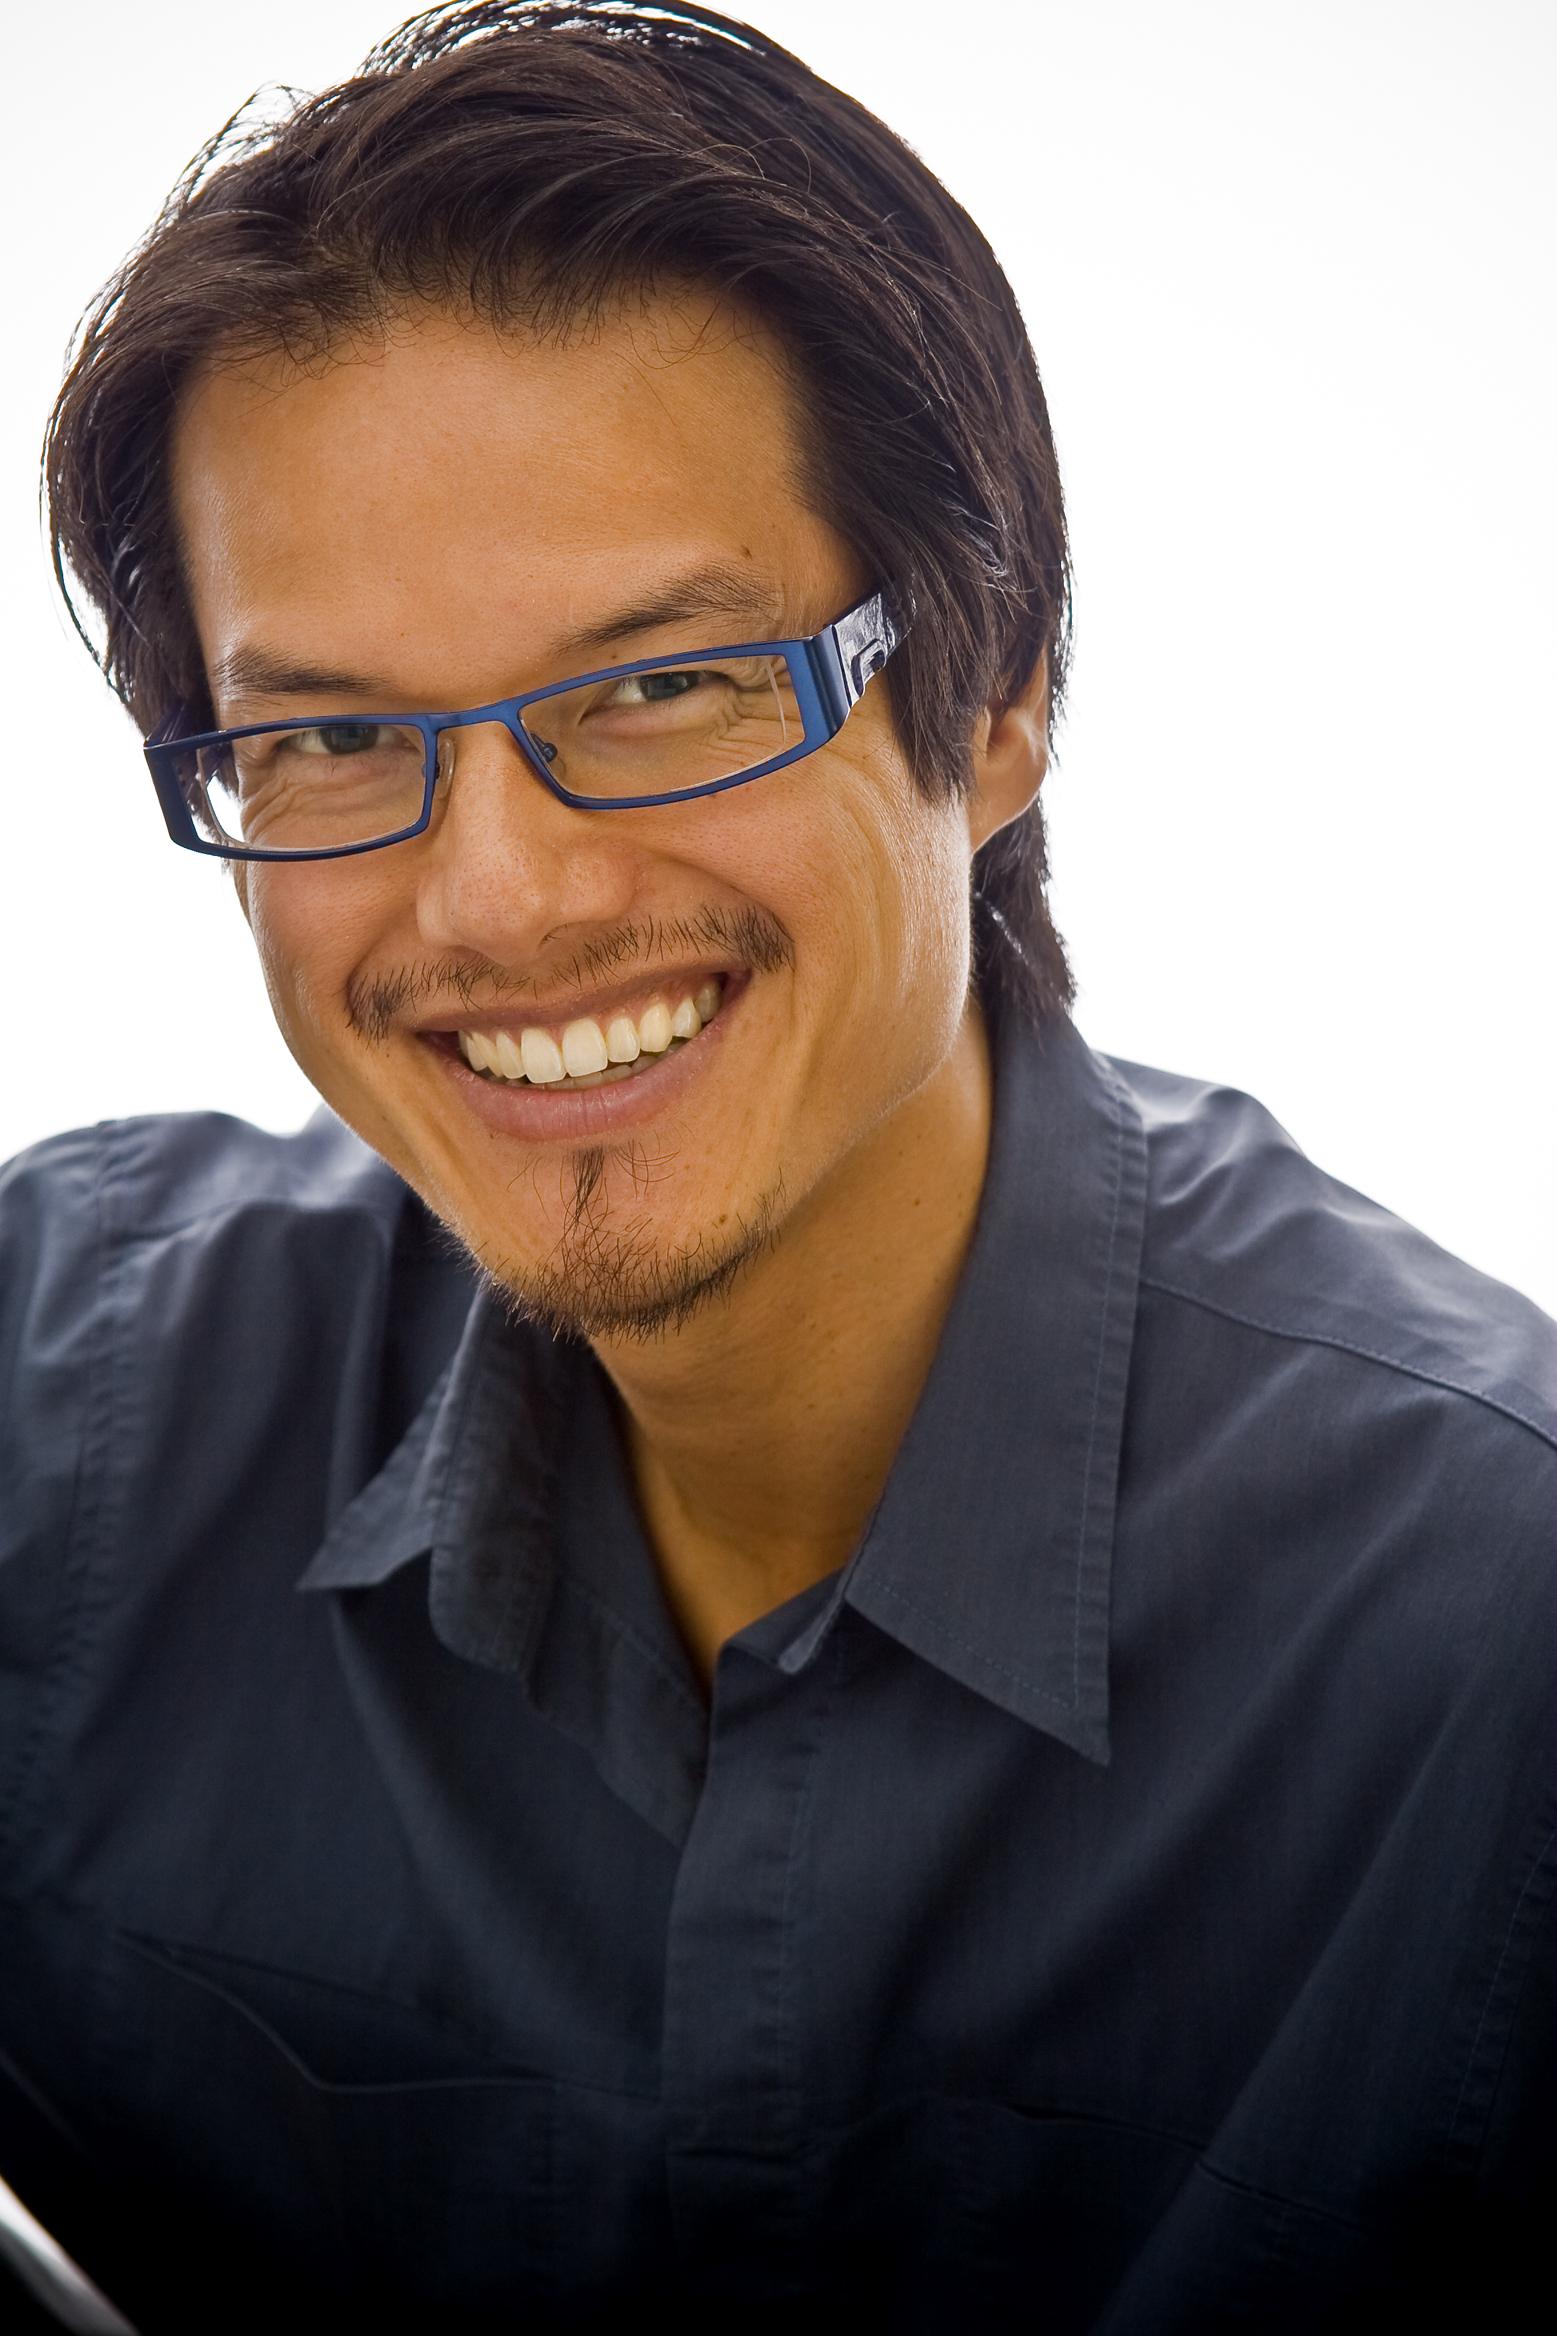 Jon YEO -Executive Speaker Coach - spreading your brand story